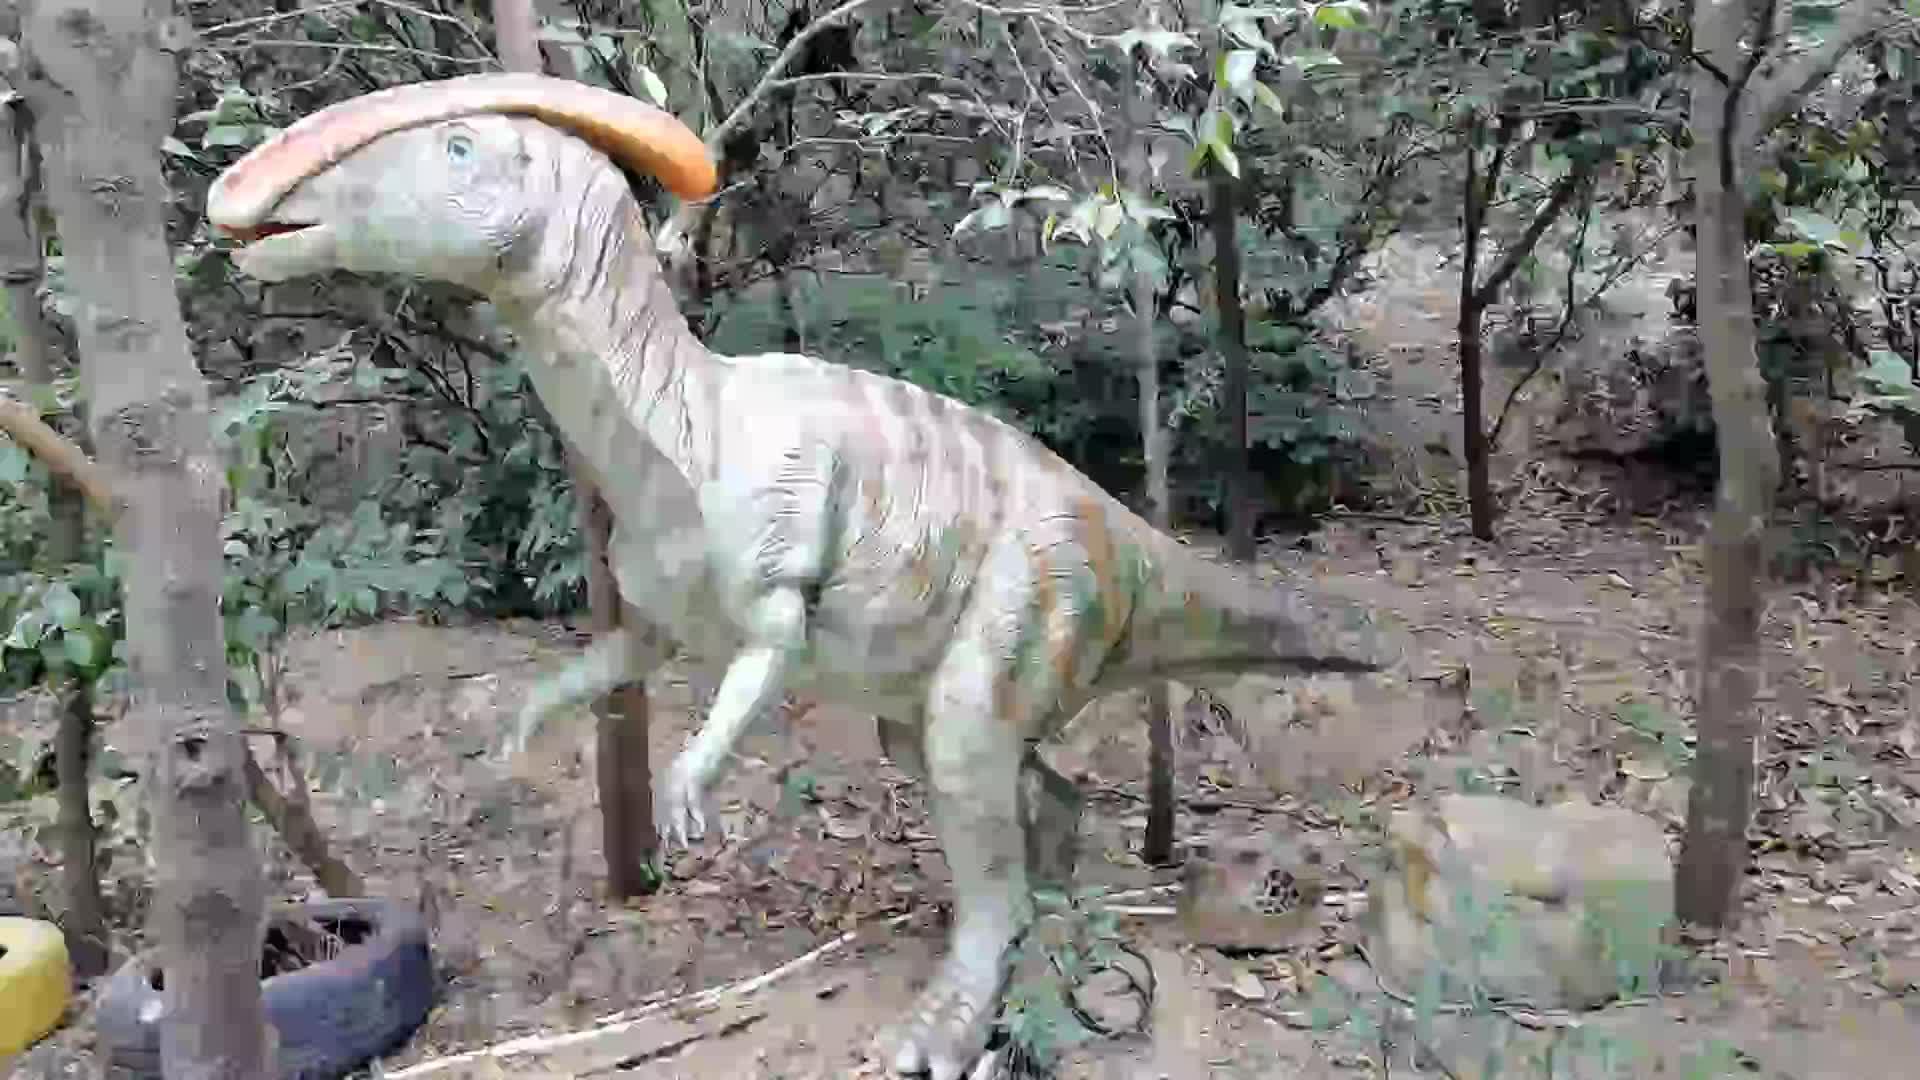 Animatronic 로봇 생활 크기 공룡 모델 판매